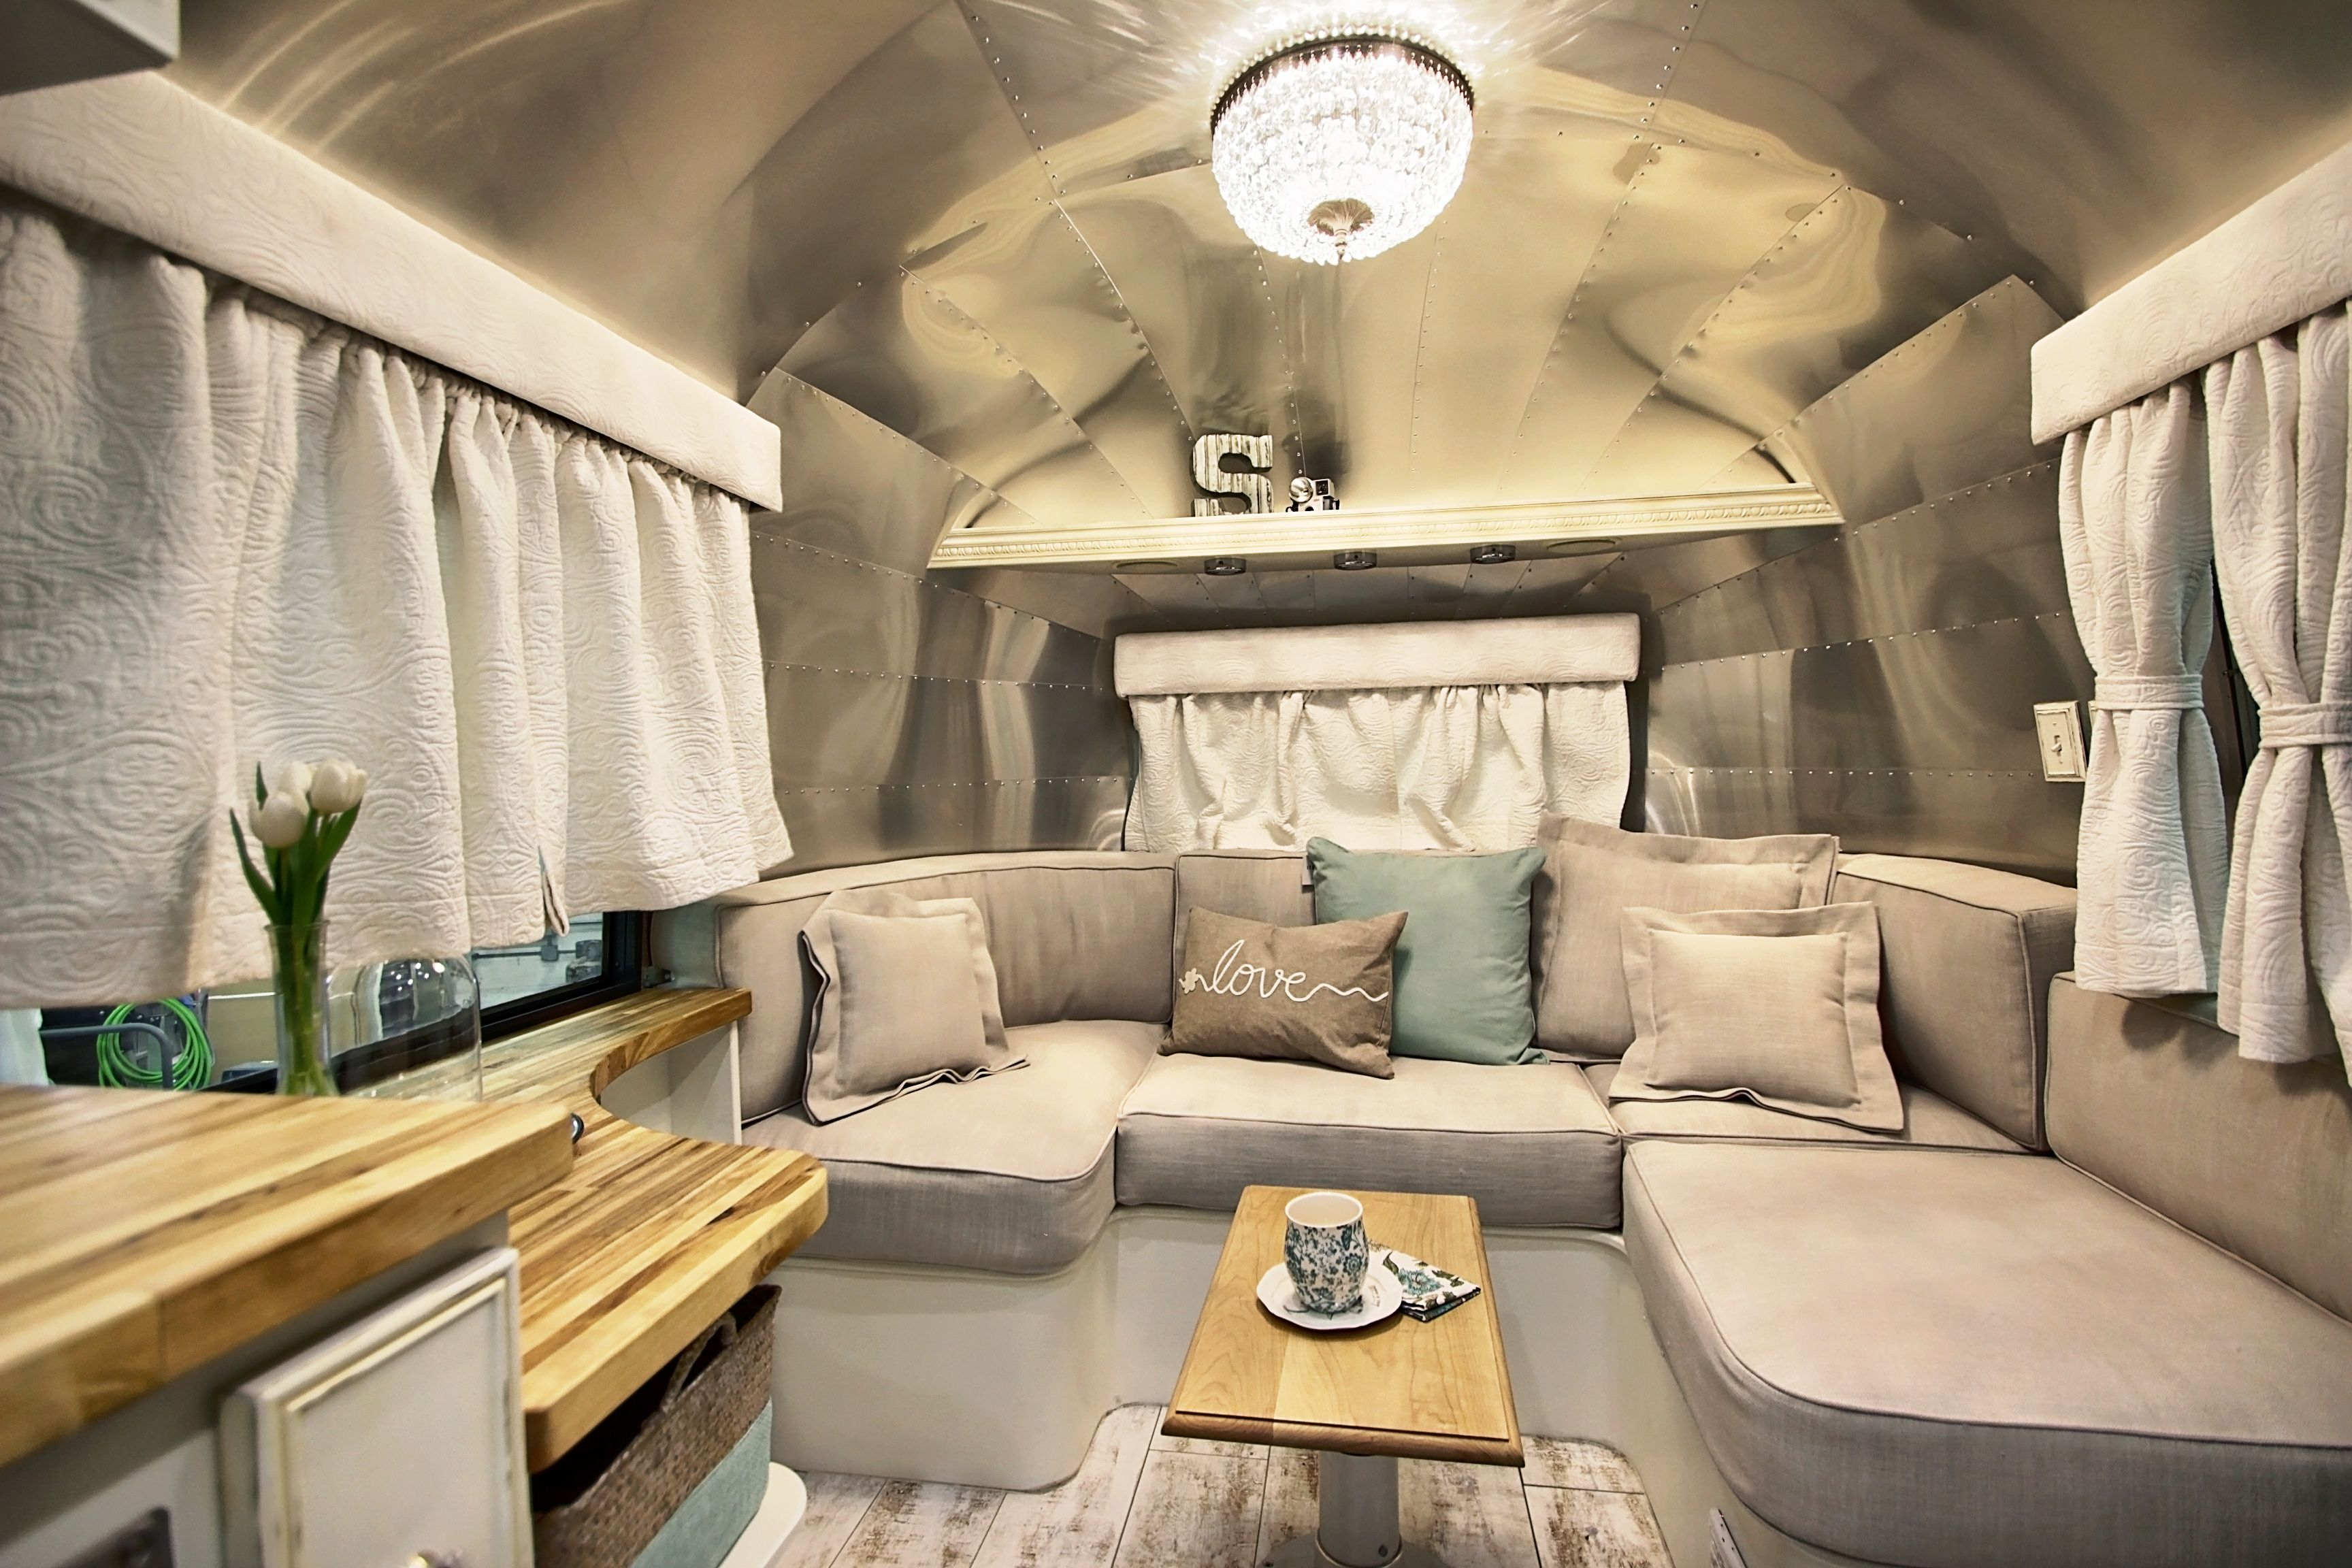 Shabby Chic Airstream Airstream Interior Rv Living Remodel